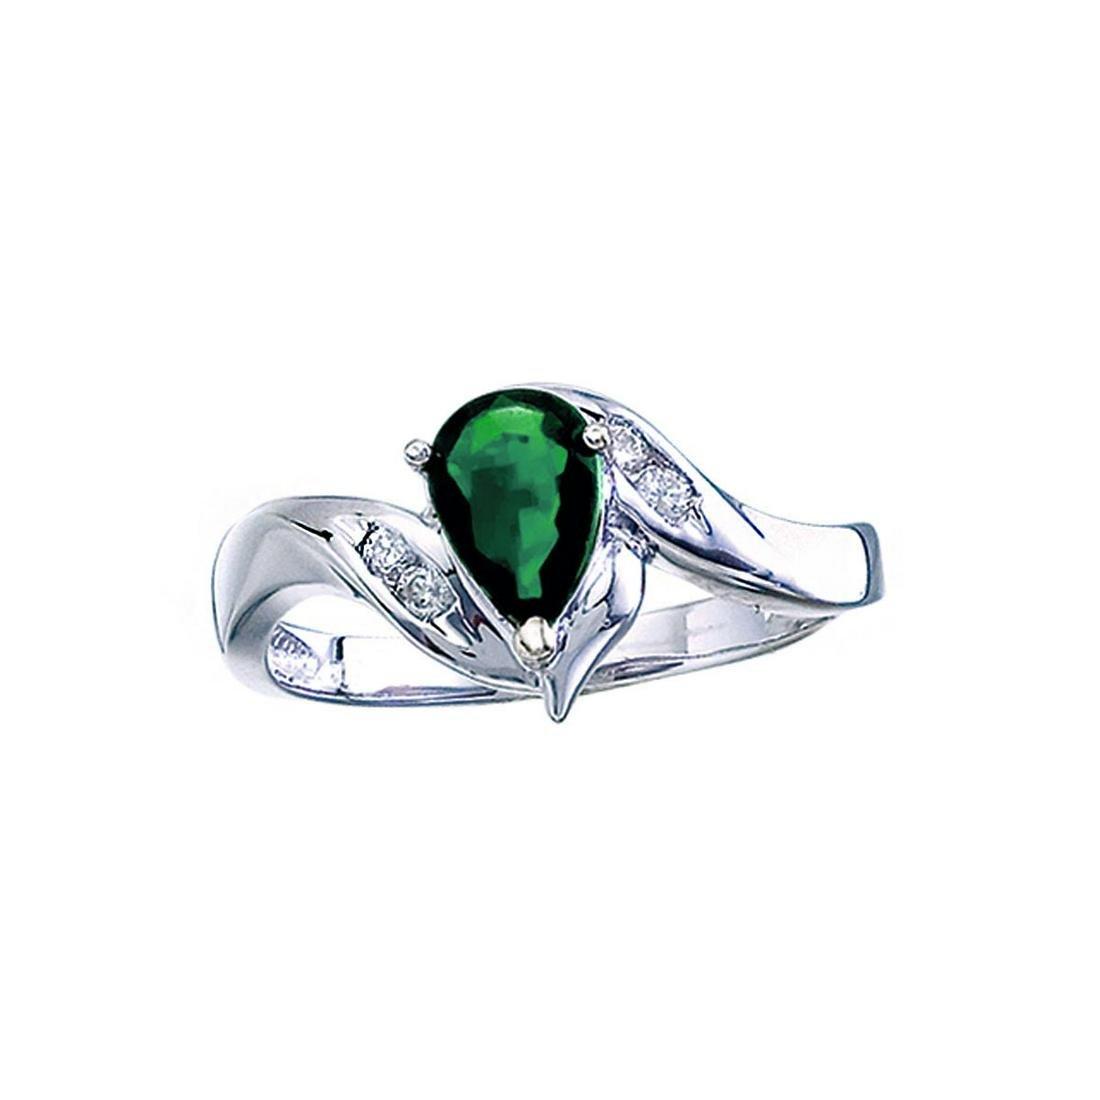 Certified 14k White Gold Pear Emerald And Diamond Swirl